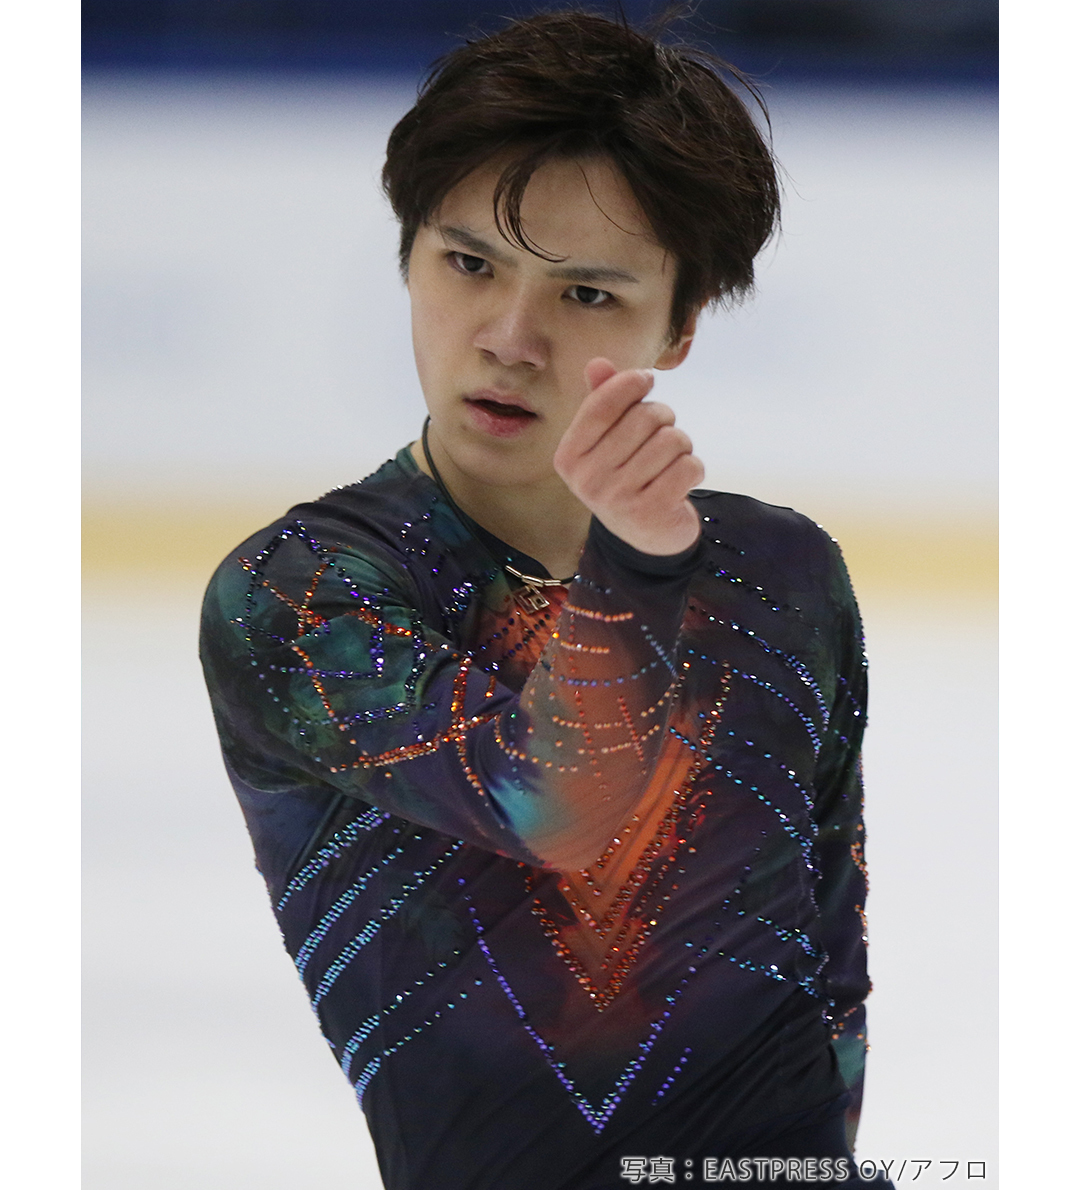 「Great Spirit」を披露するフィギュアスケート男子シングル宇野昌磨(うのしょうま)選手